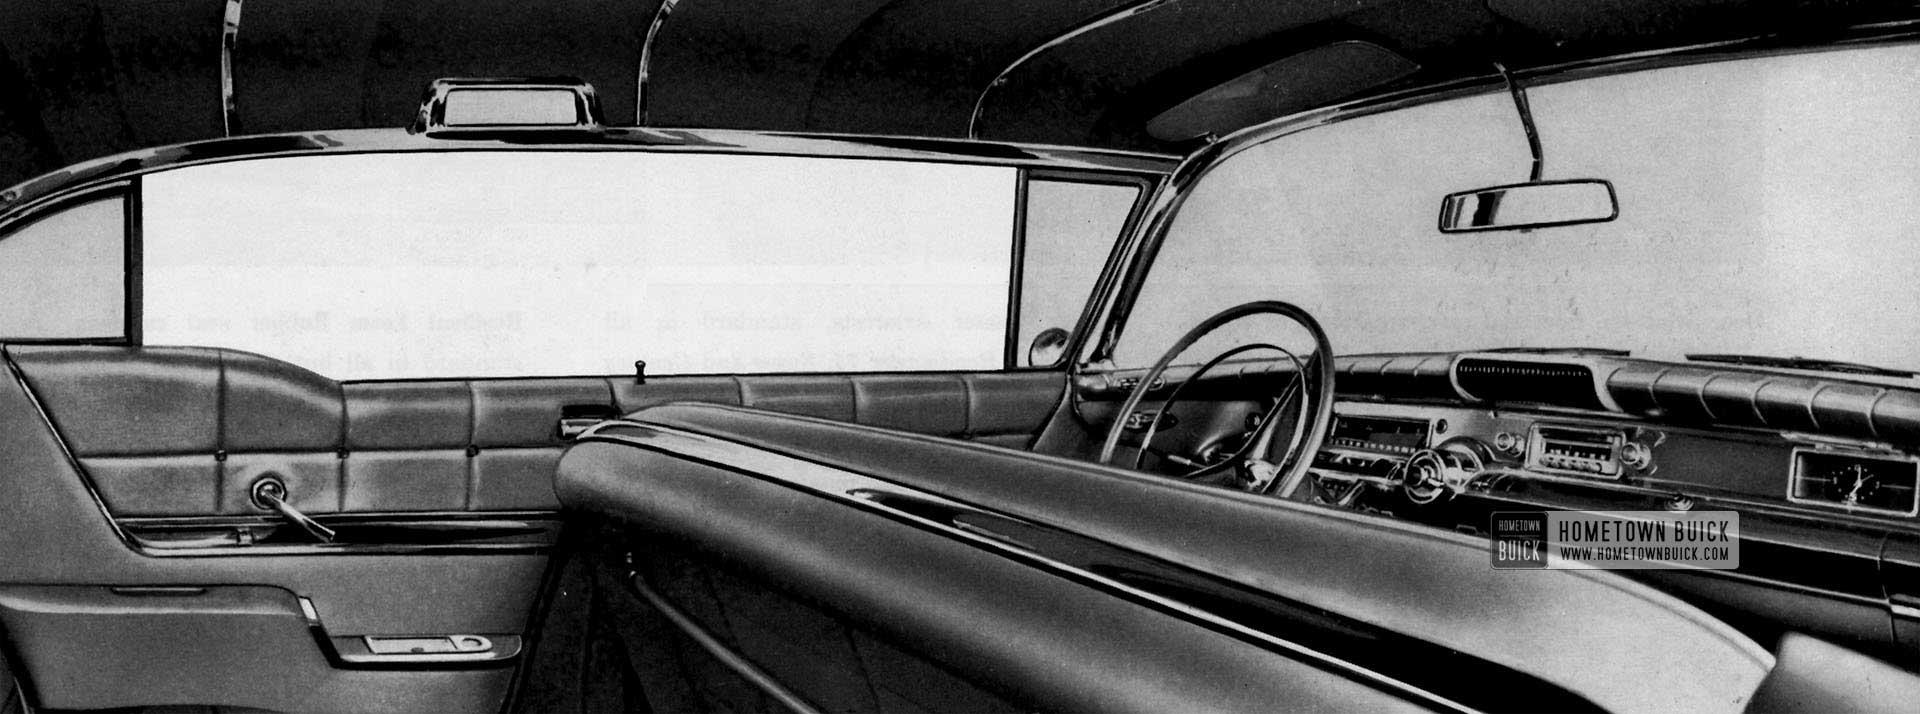 1958 Buick Interior Slider